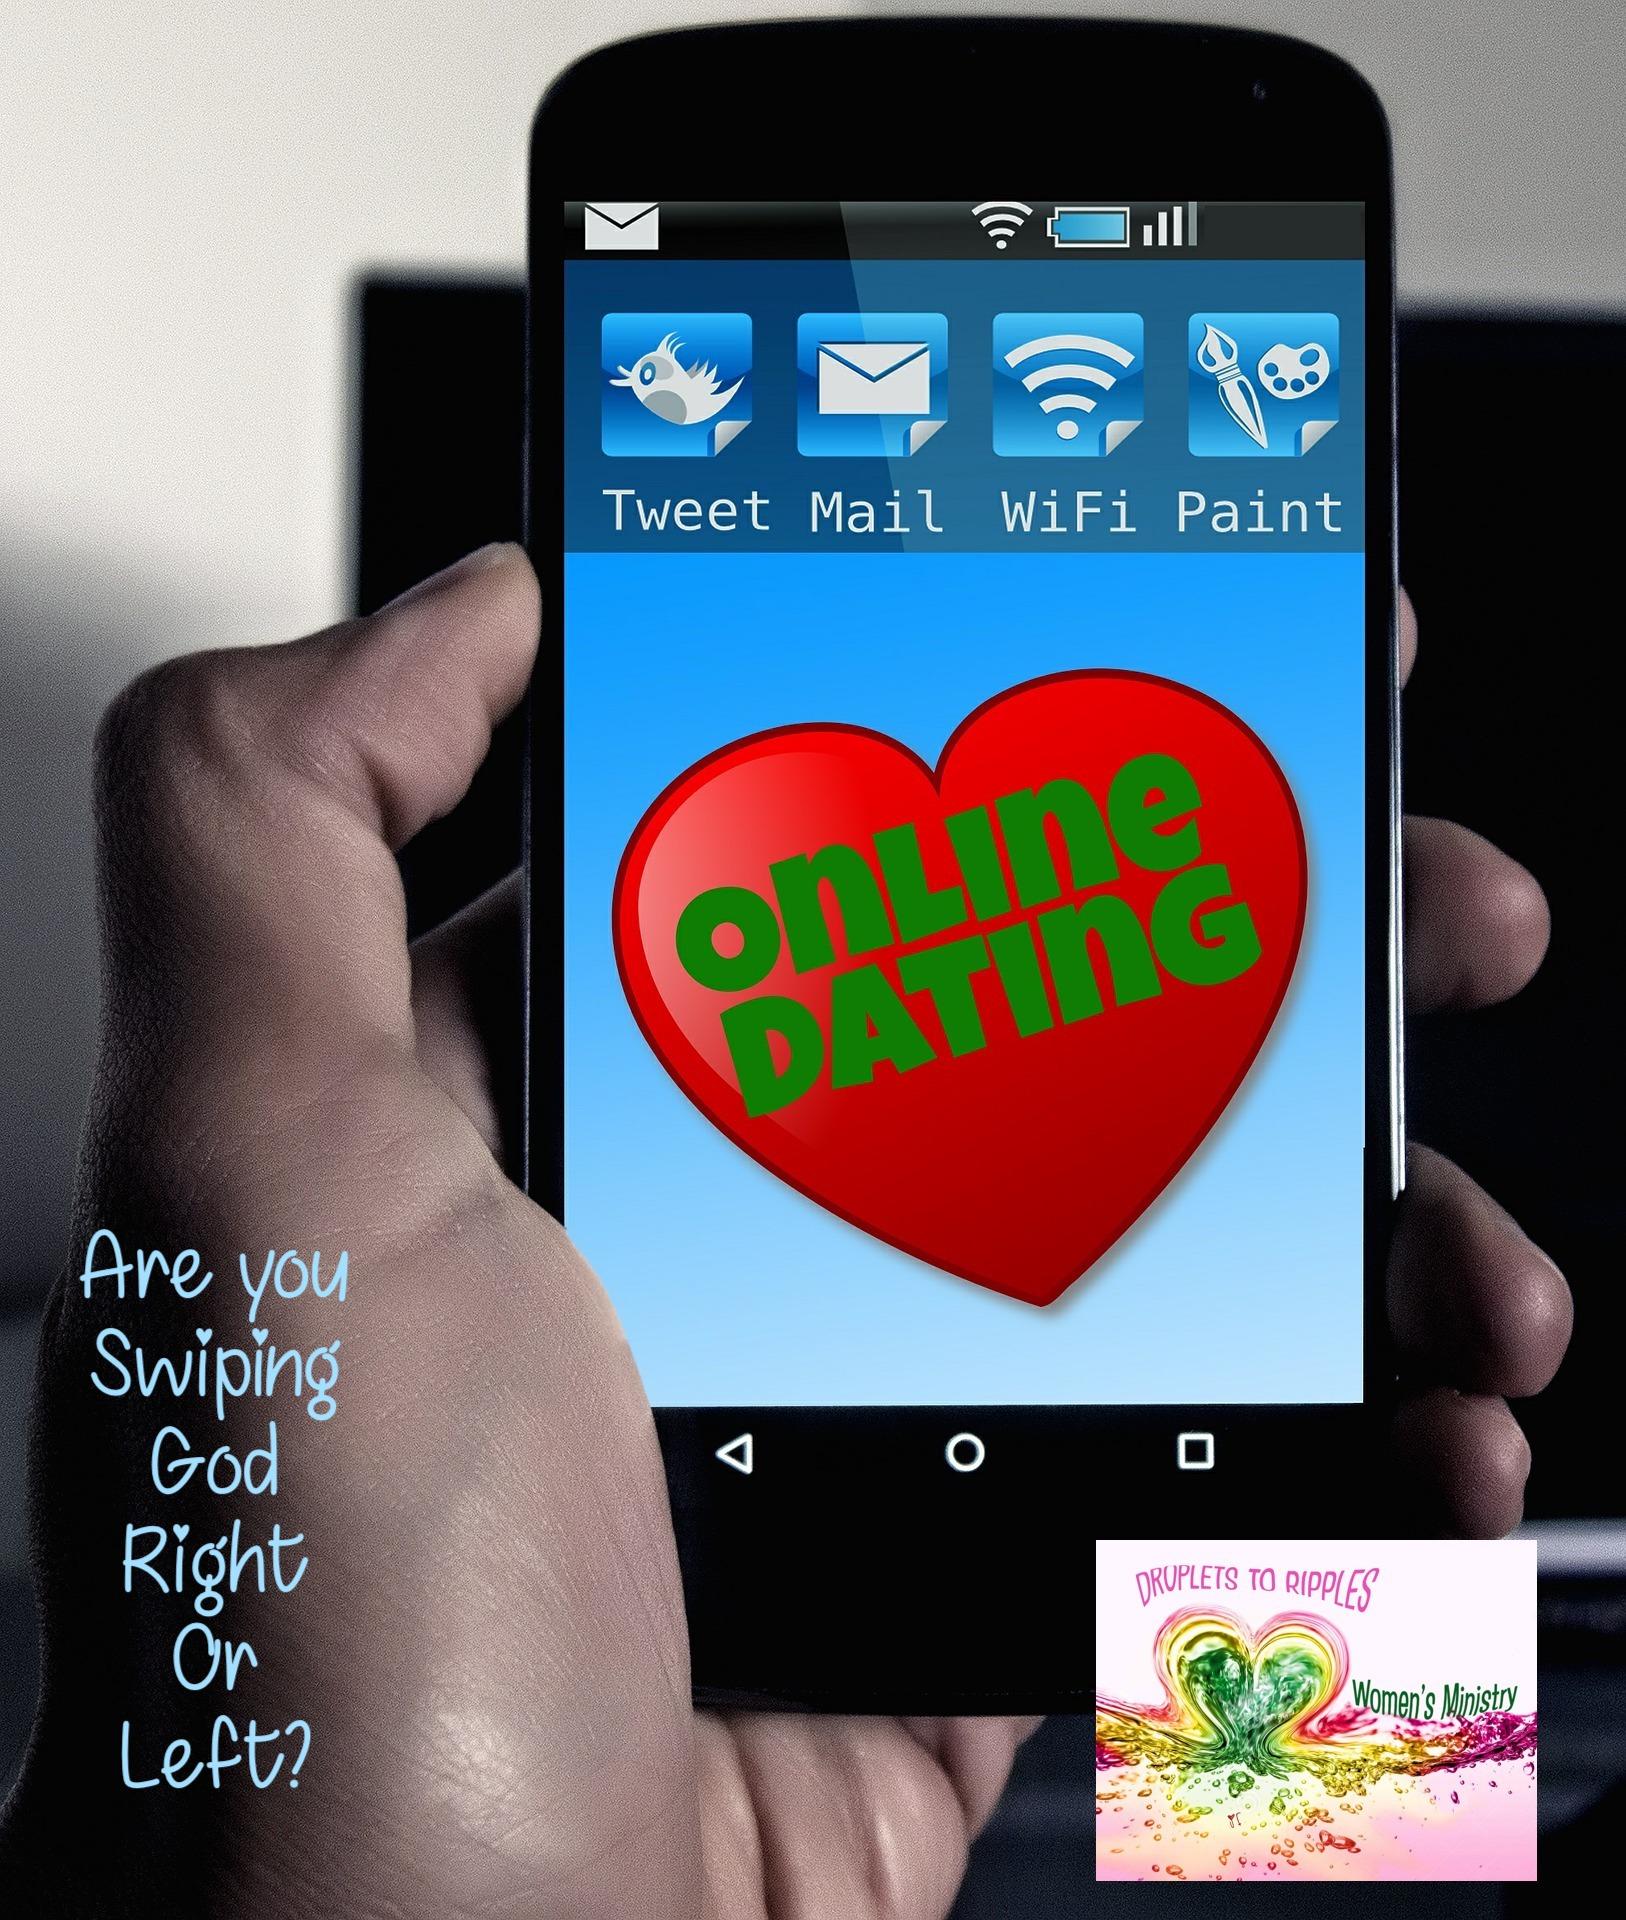 Online dating where you swipe